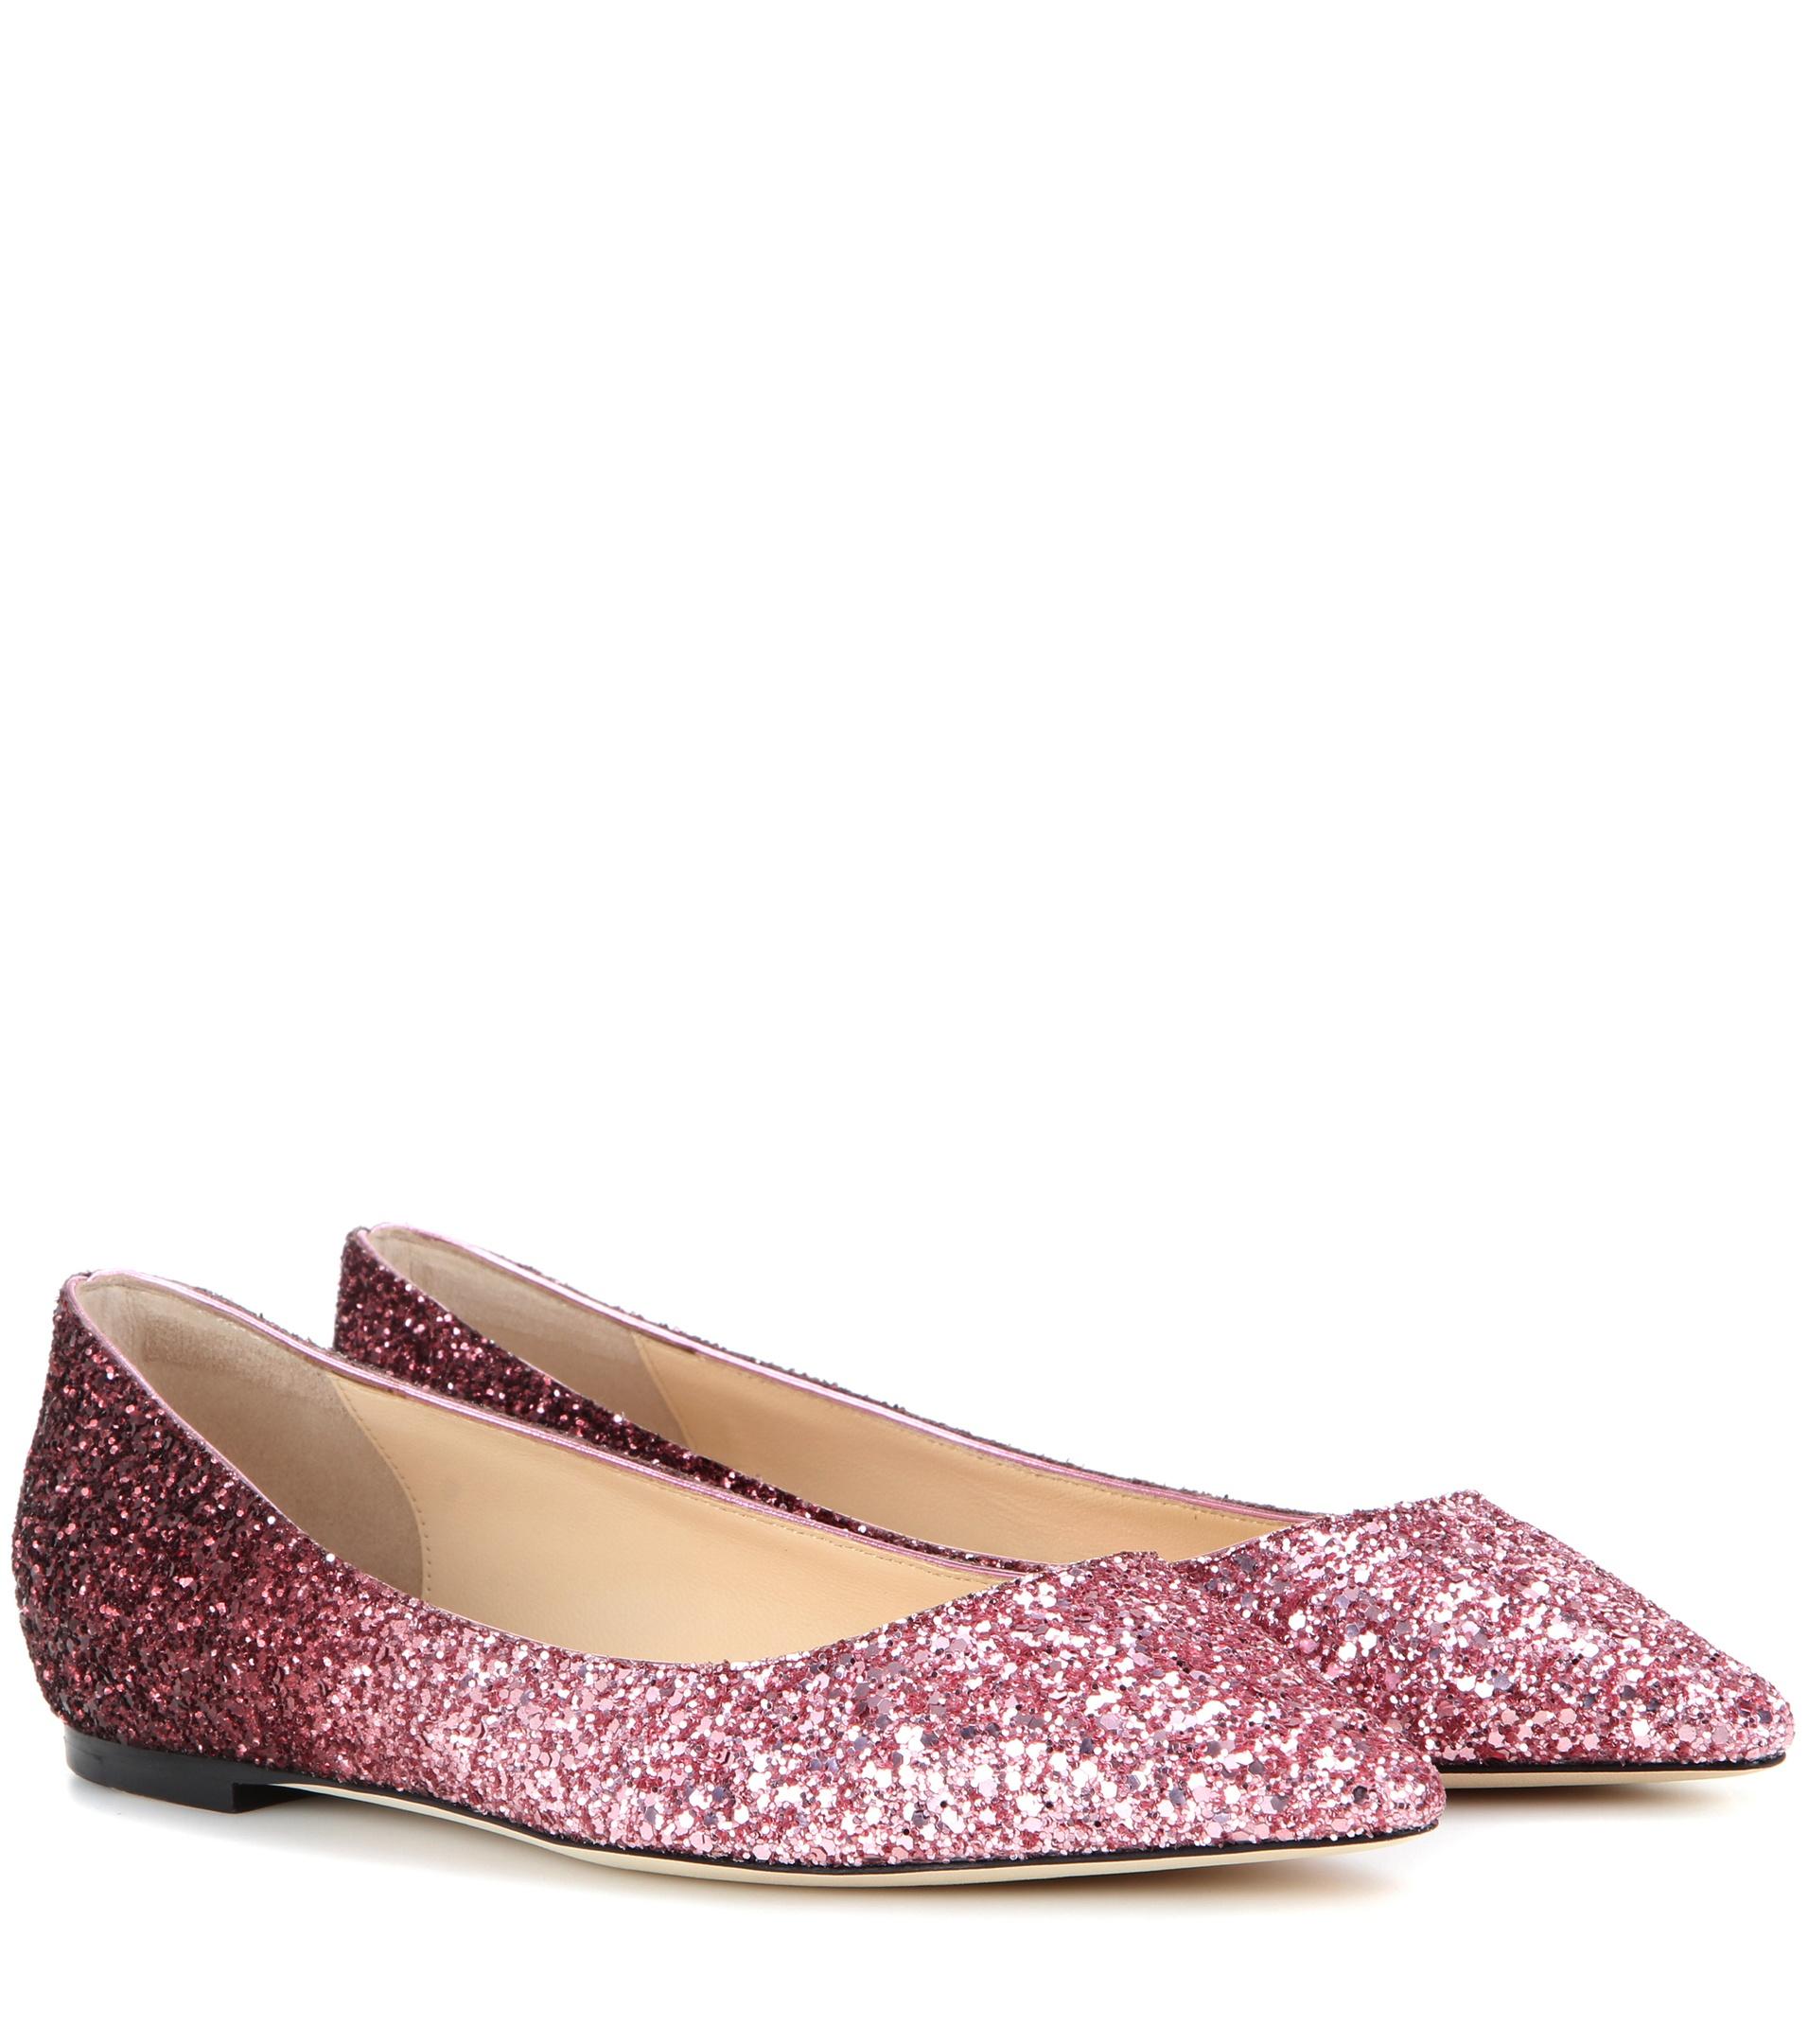 Romy ballerinas - Pink & Purple Jimmy Choo London OvMac5